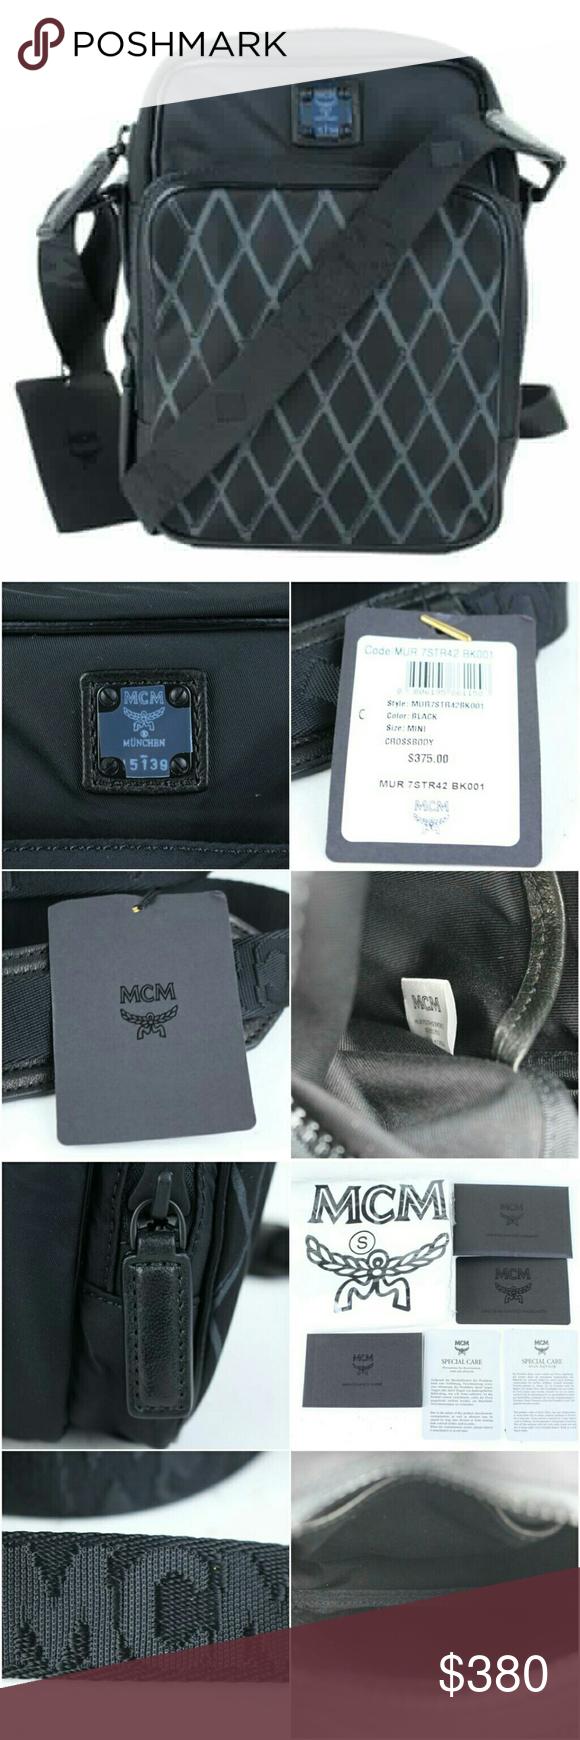 3cc9b111ed MCM Nylon Mini 3mcj922 BLACK Cross Body Bag